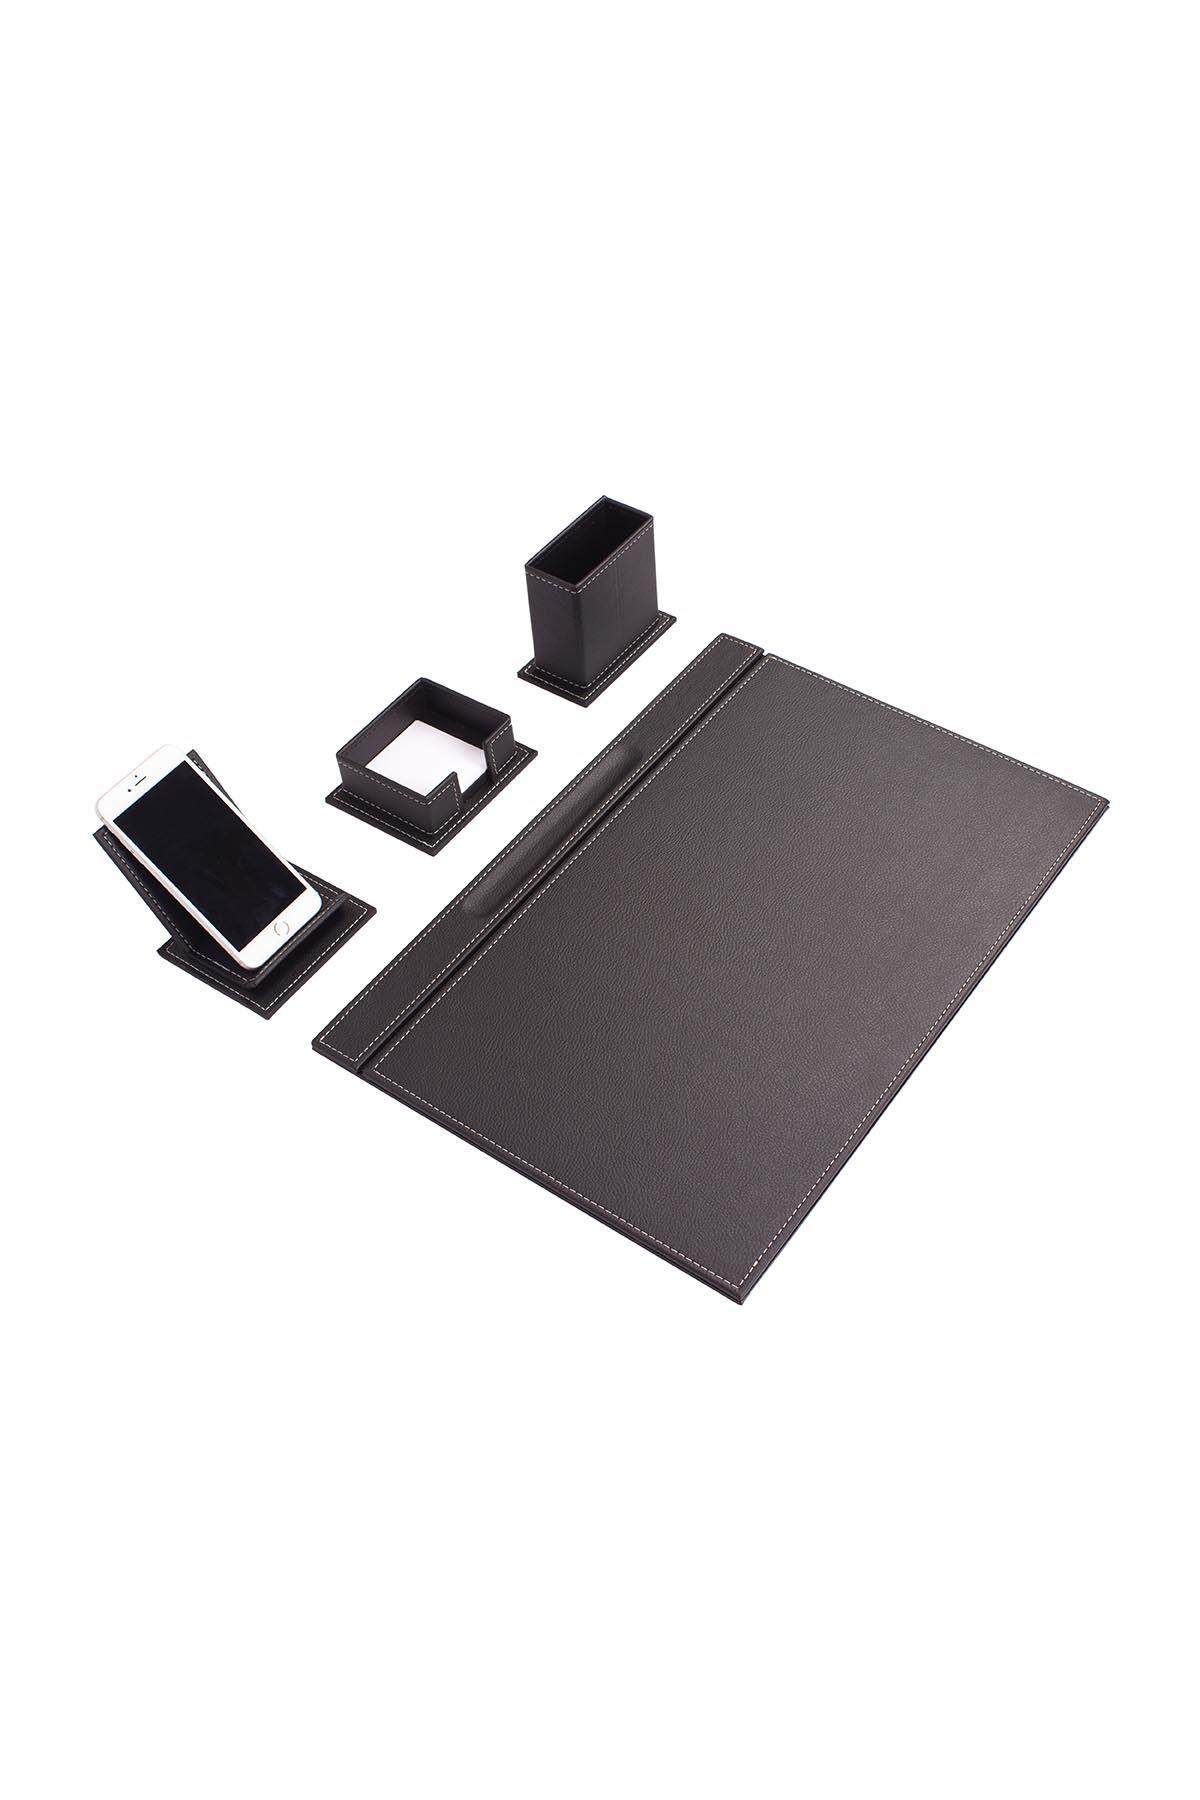 Vega Leather Desk Set Black 4 Accessories